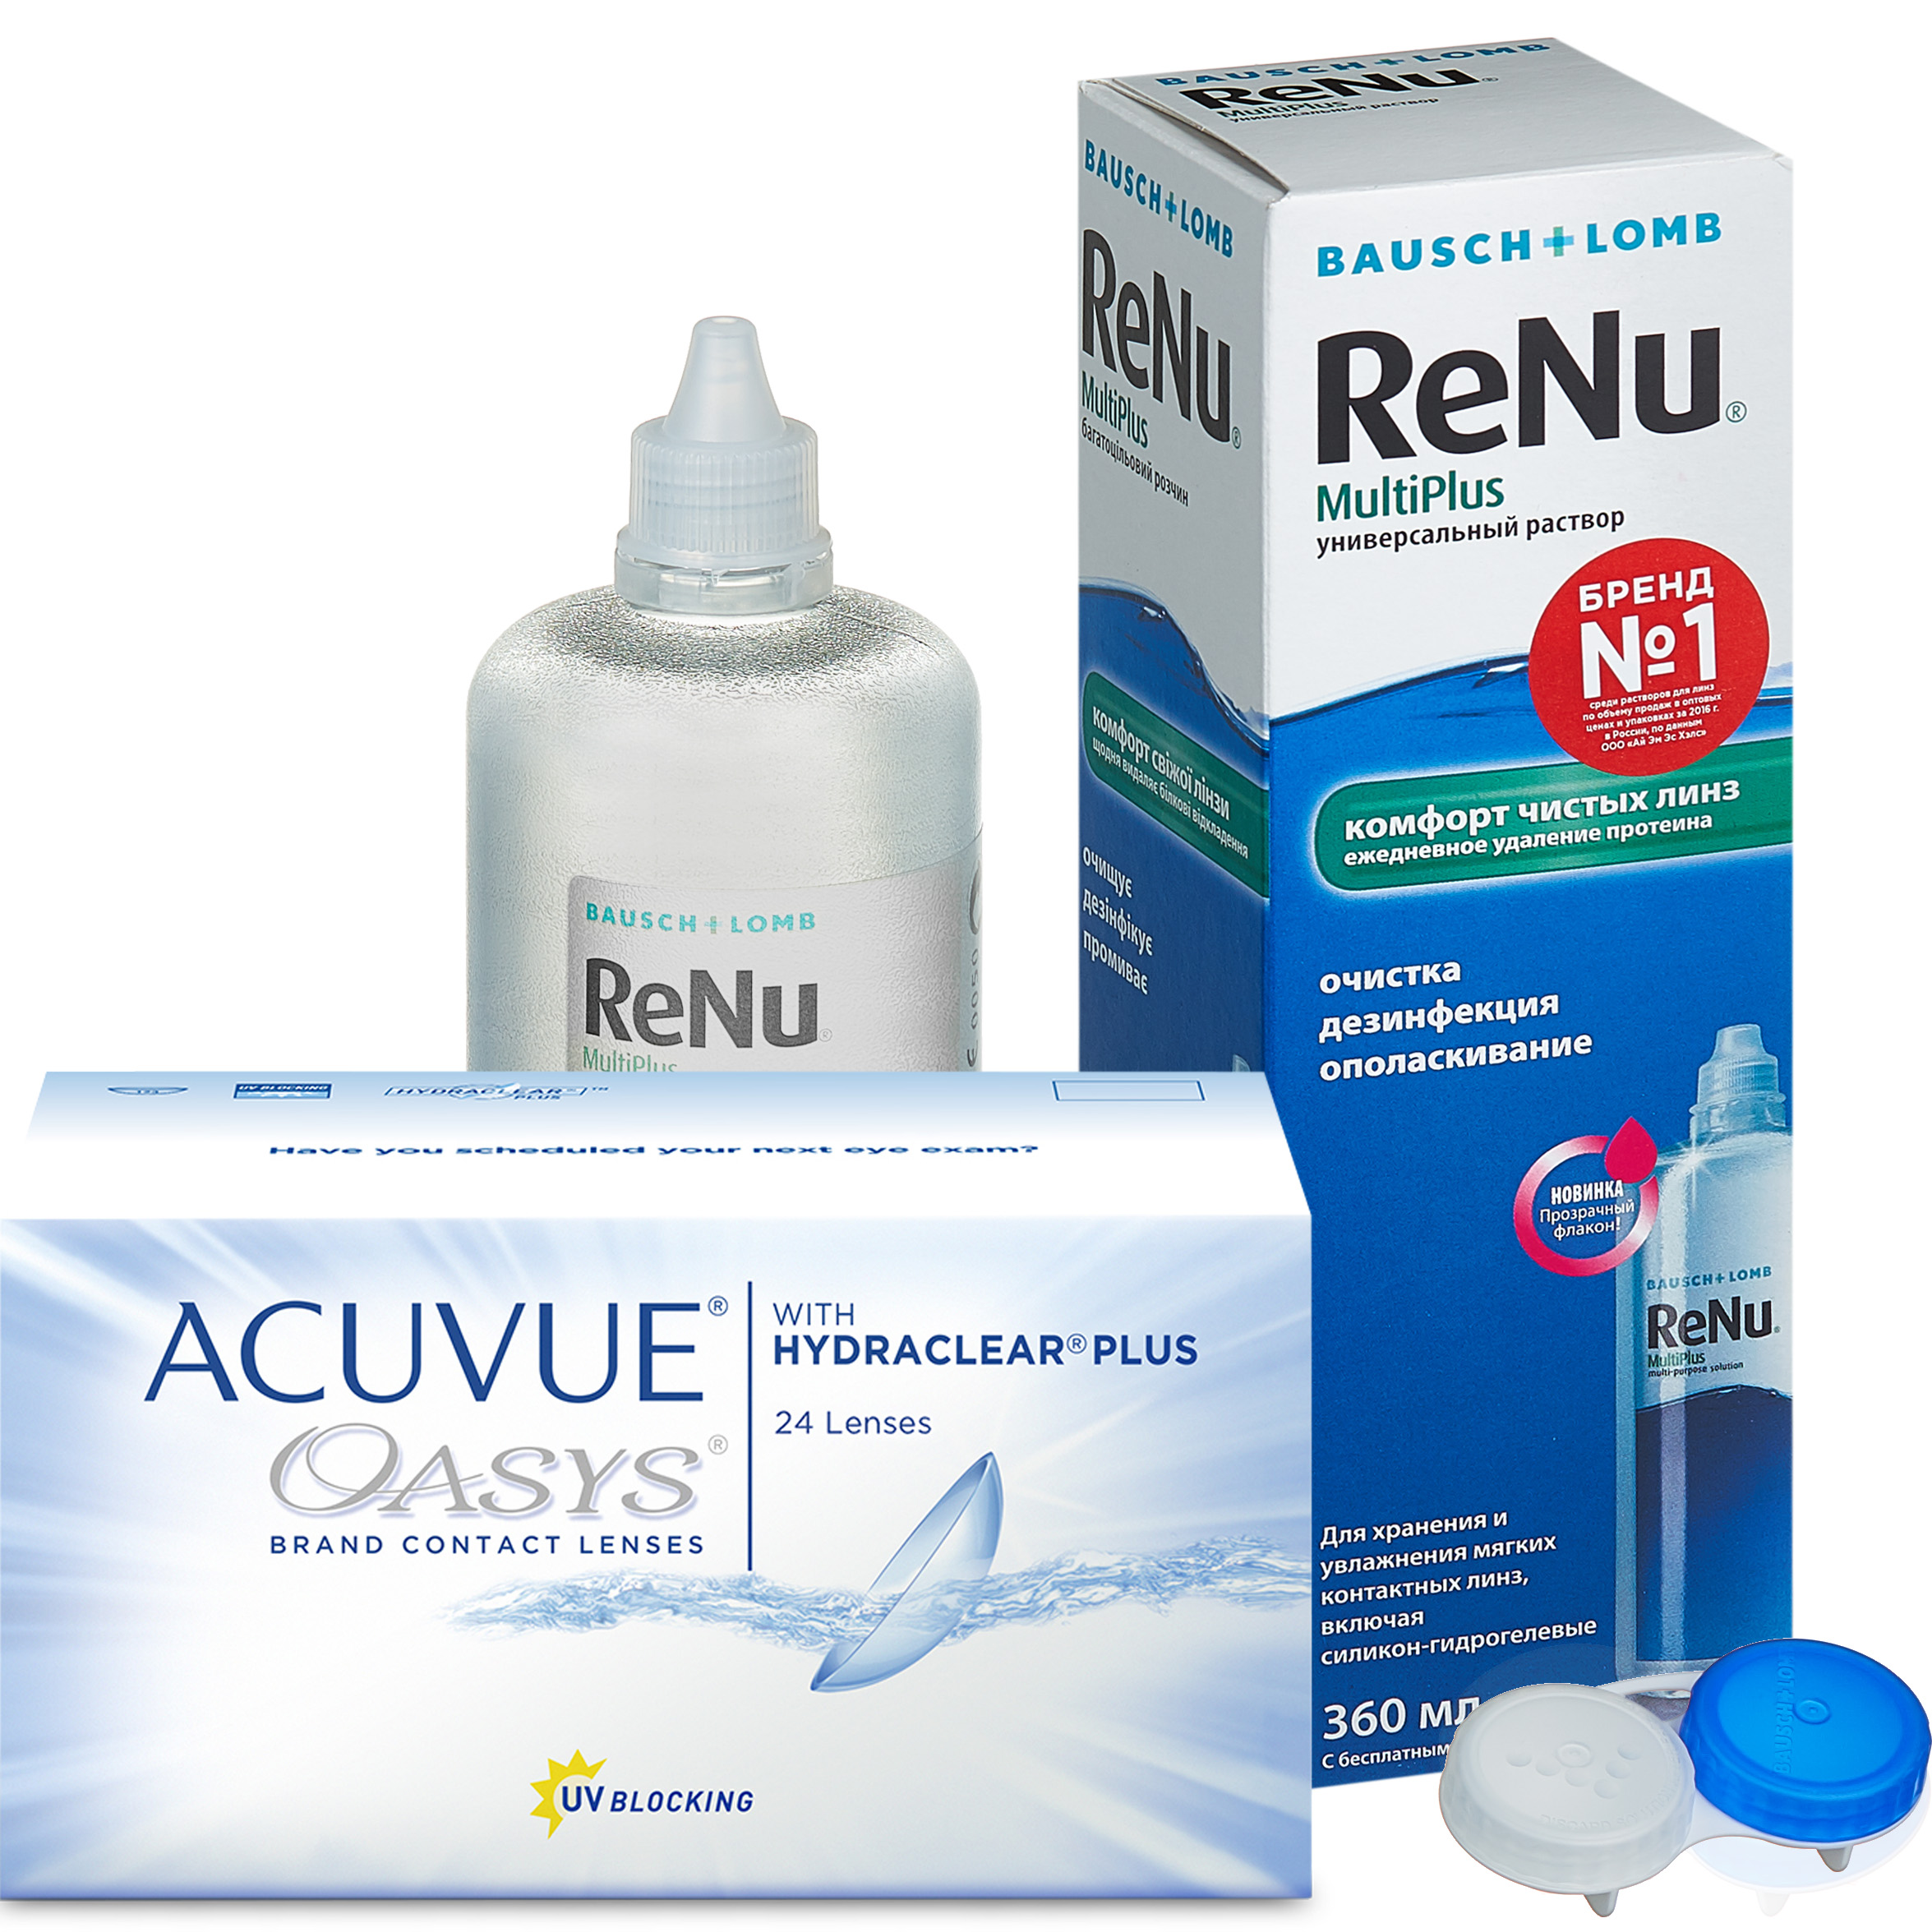 Купить Oasys with Hydraclear Plus 24 линзы + ReNu MultiPlus, Линзы Acuvue Oasys with Hydraclear Plus 24 линзы R 8.8 -12, 00 + ReNu Multi Plus 360 мл